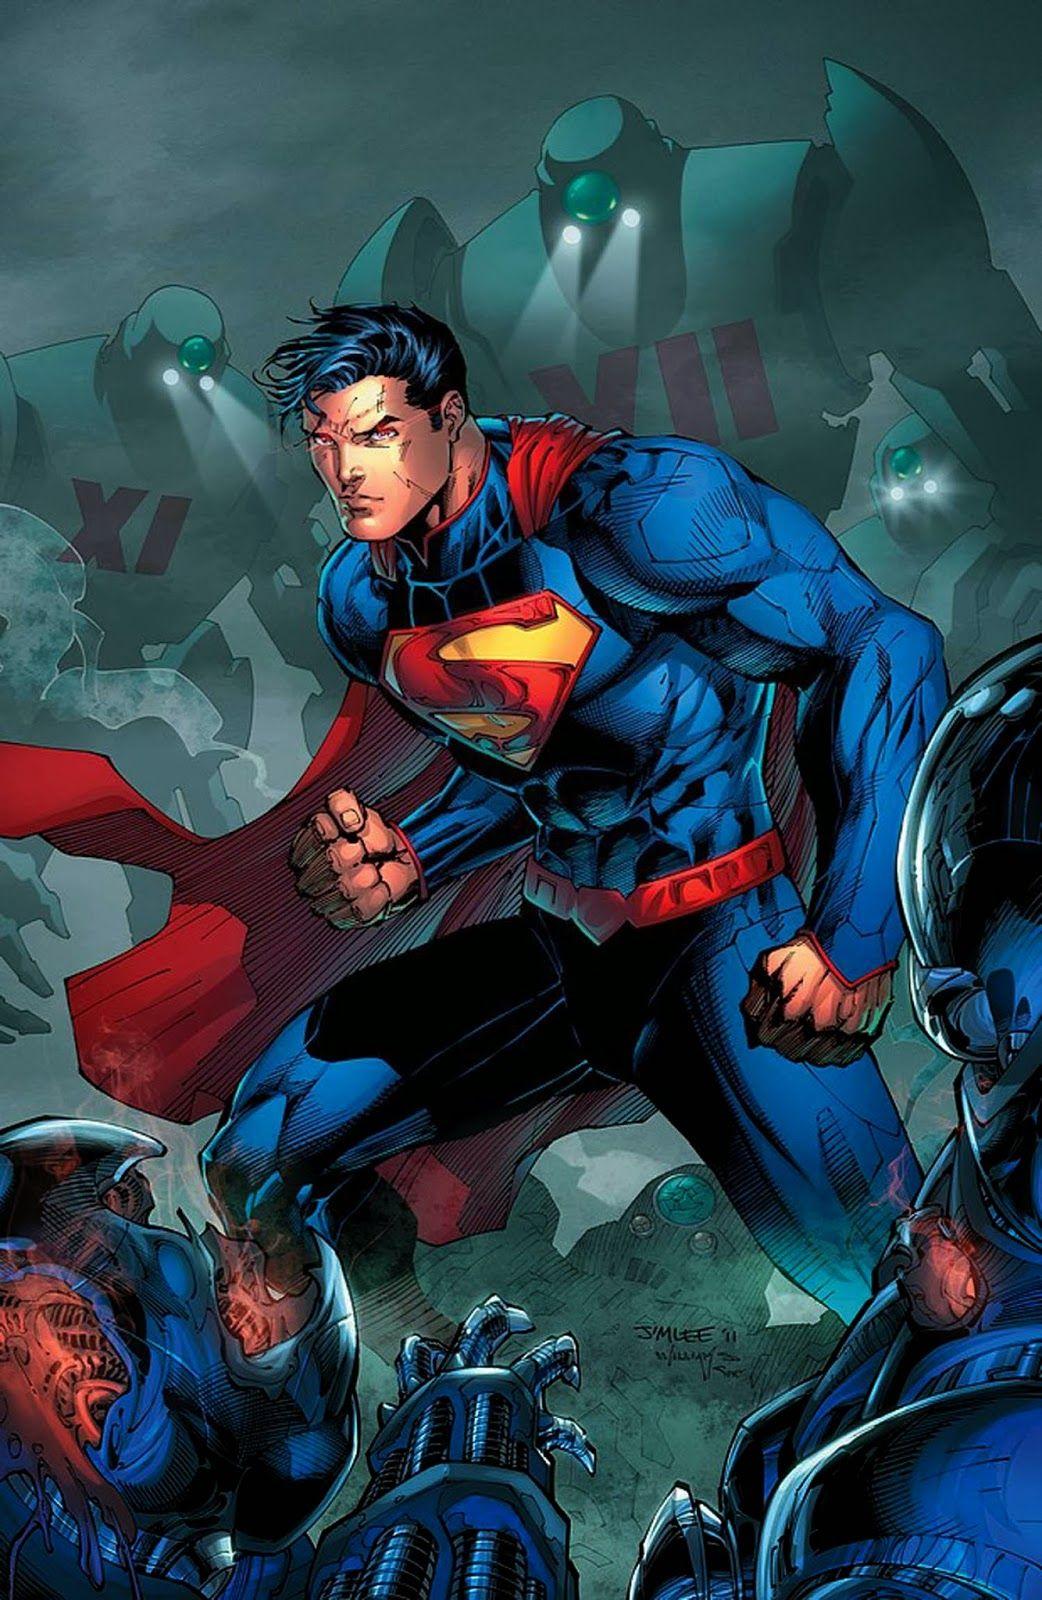 Aquila_della_notte Comics Collections: The NEW 52 Story: Superman [Parte 2]